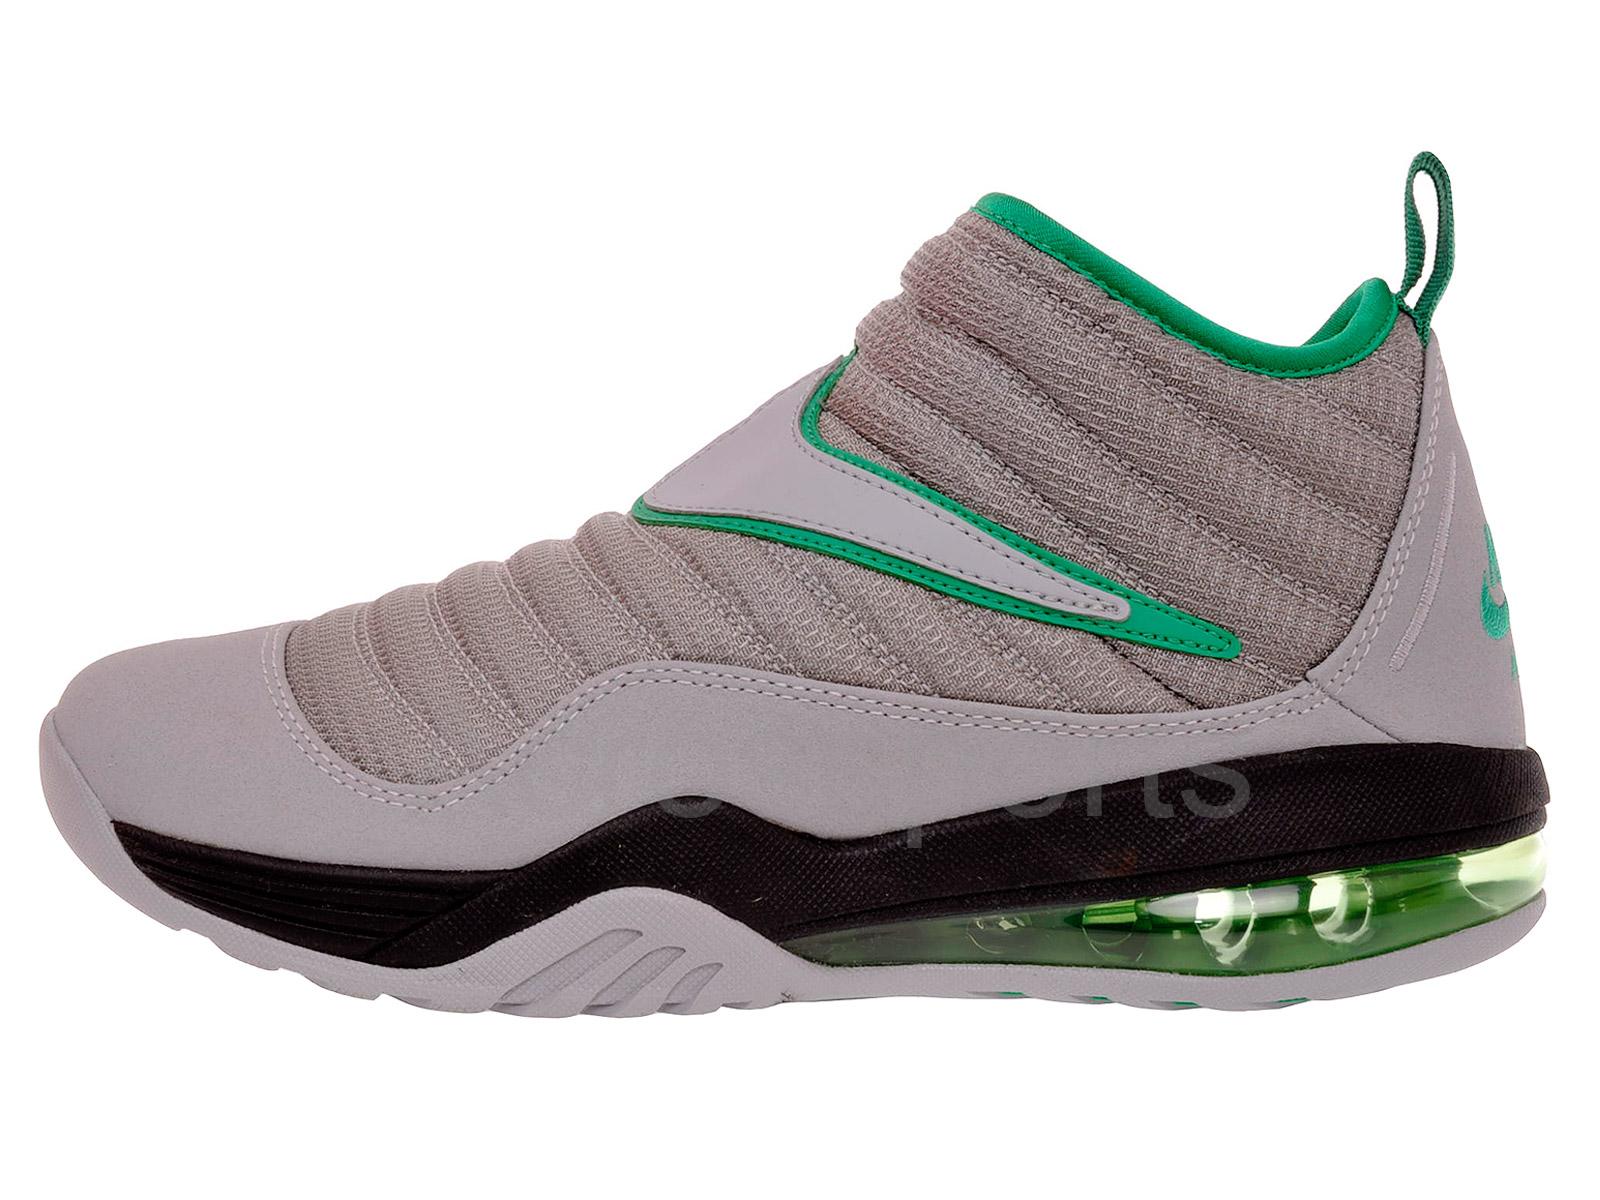 nike air max shake evolve mens basketball shoes dennis